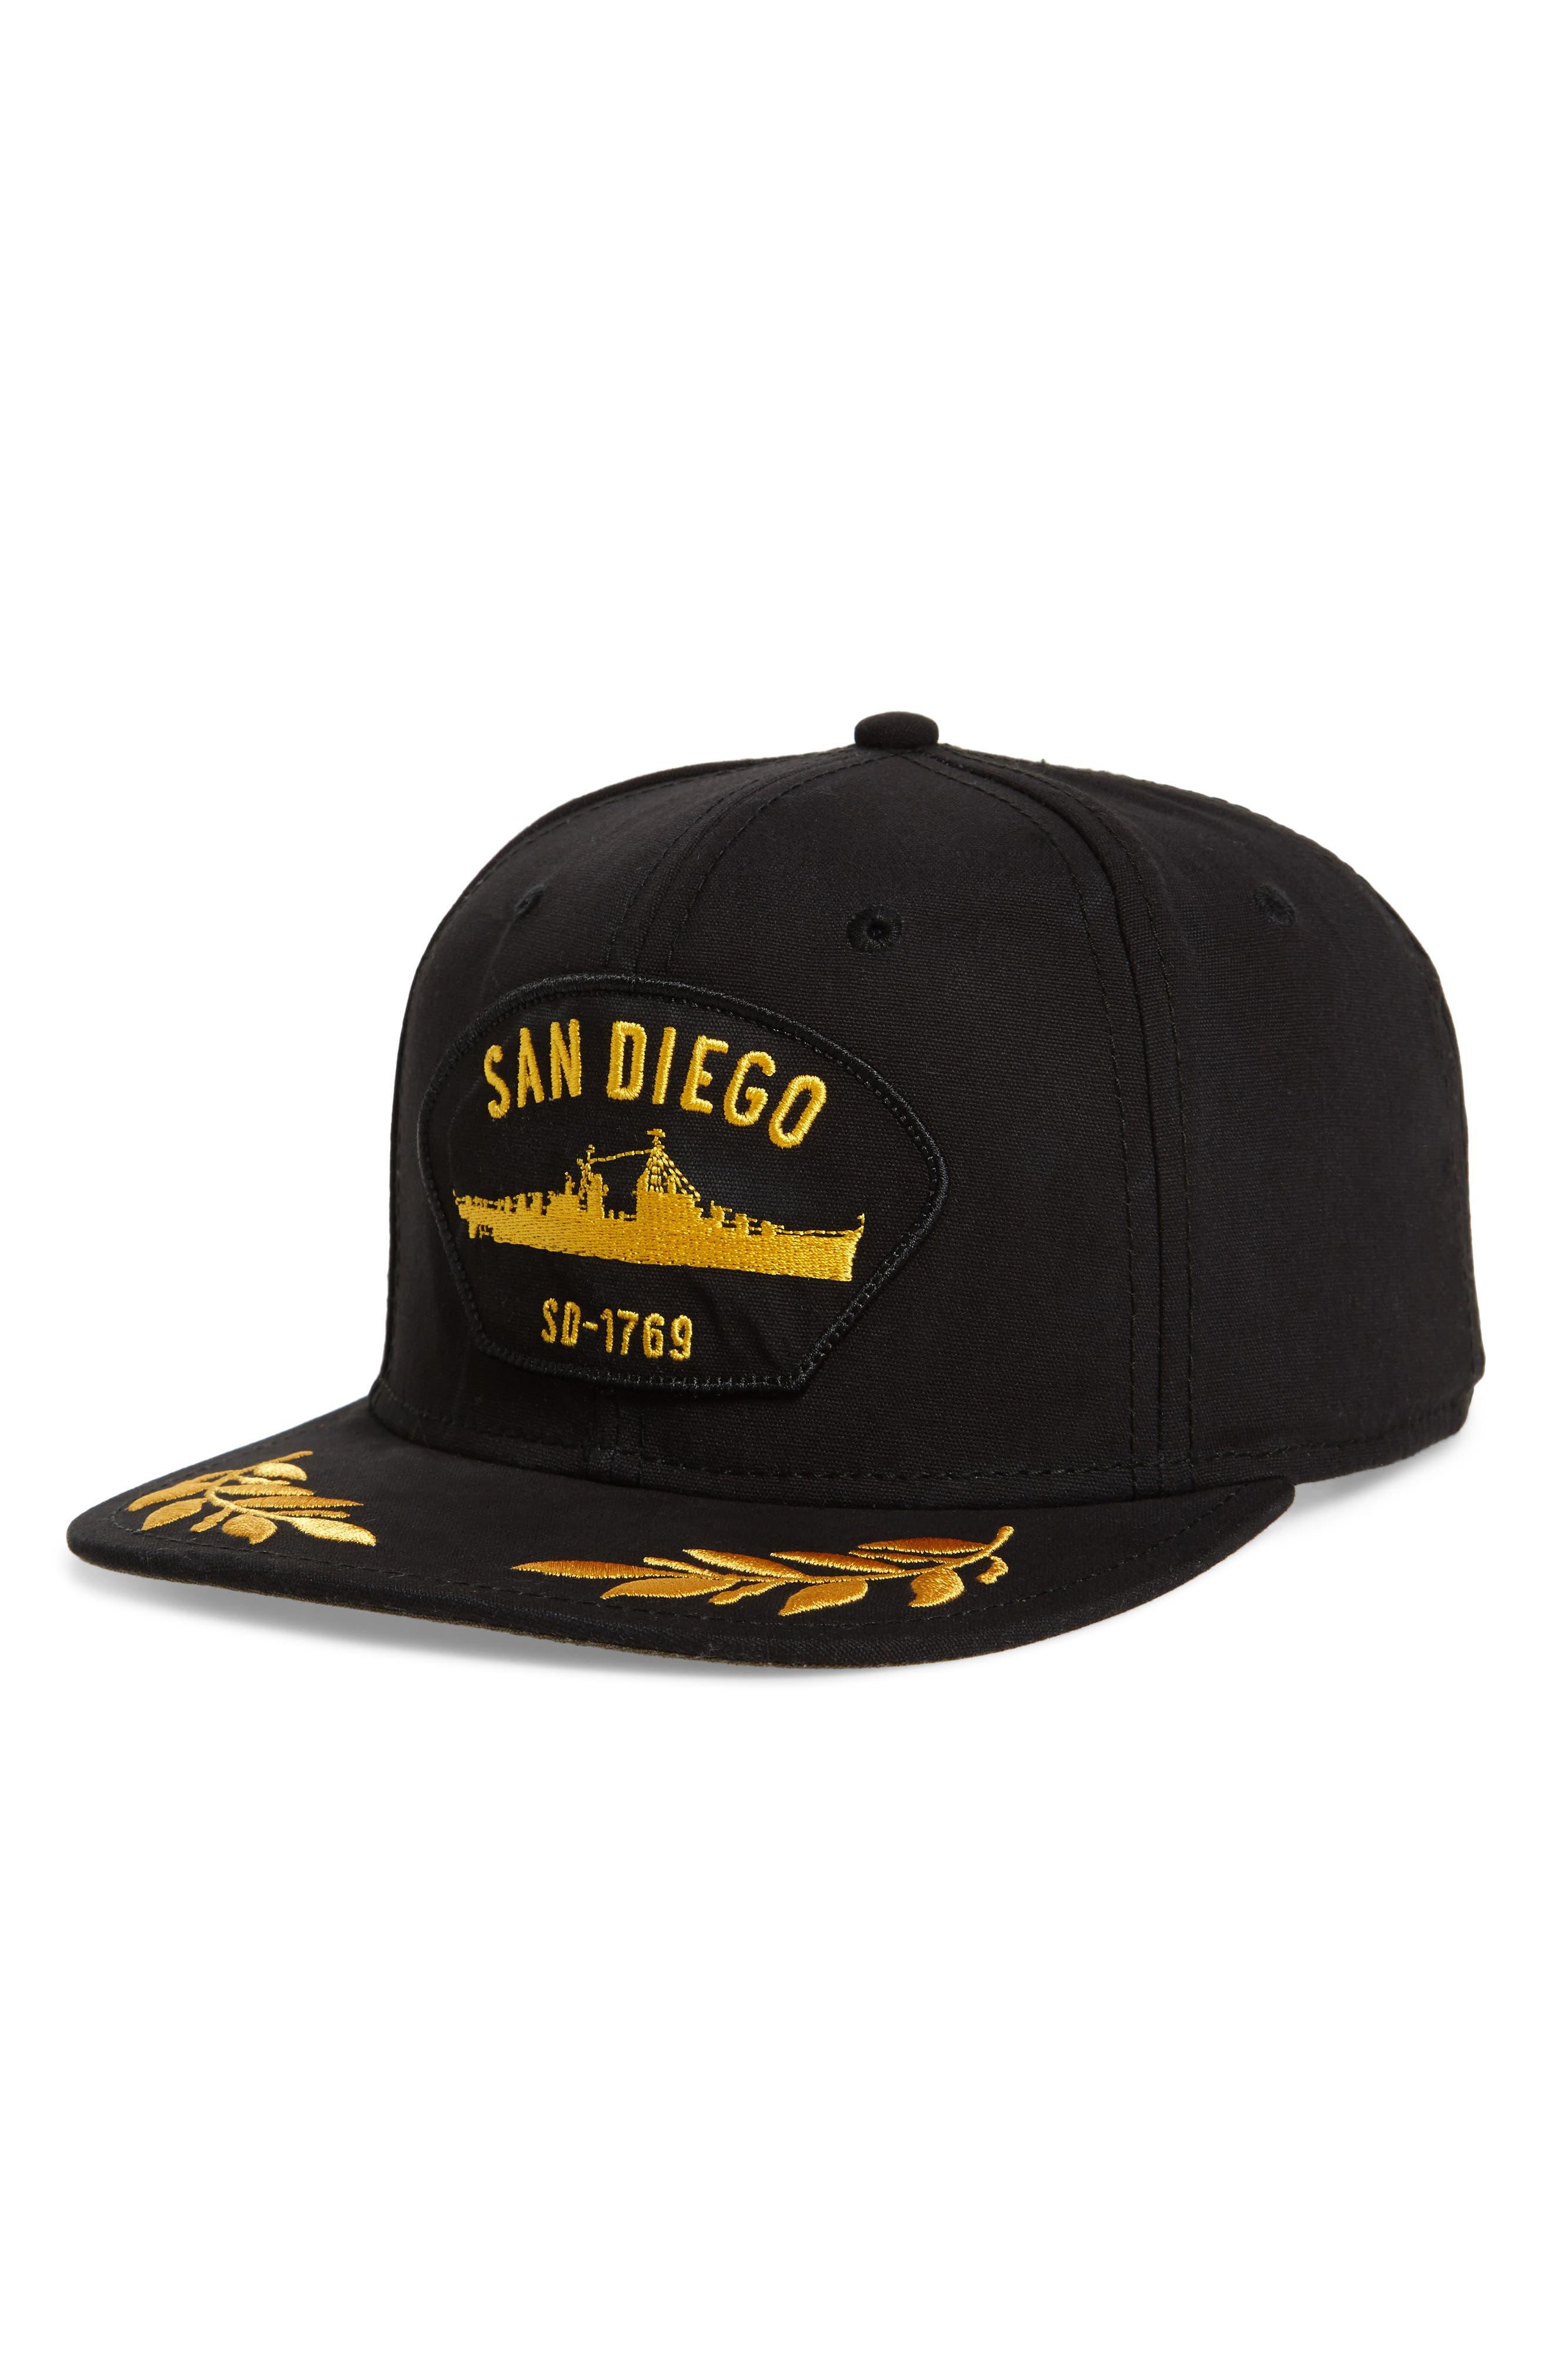 Goorin Bros. San Diego Snapback Baseball Cap